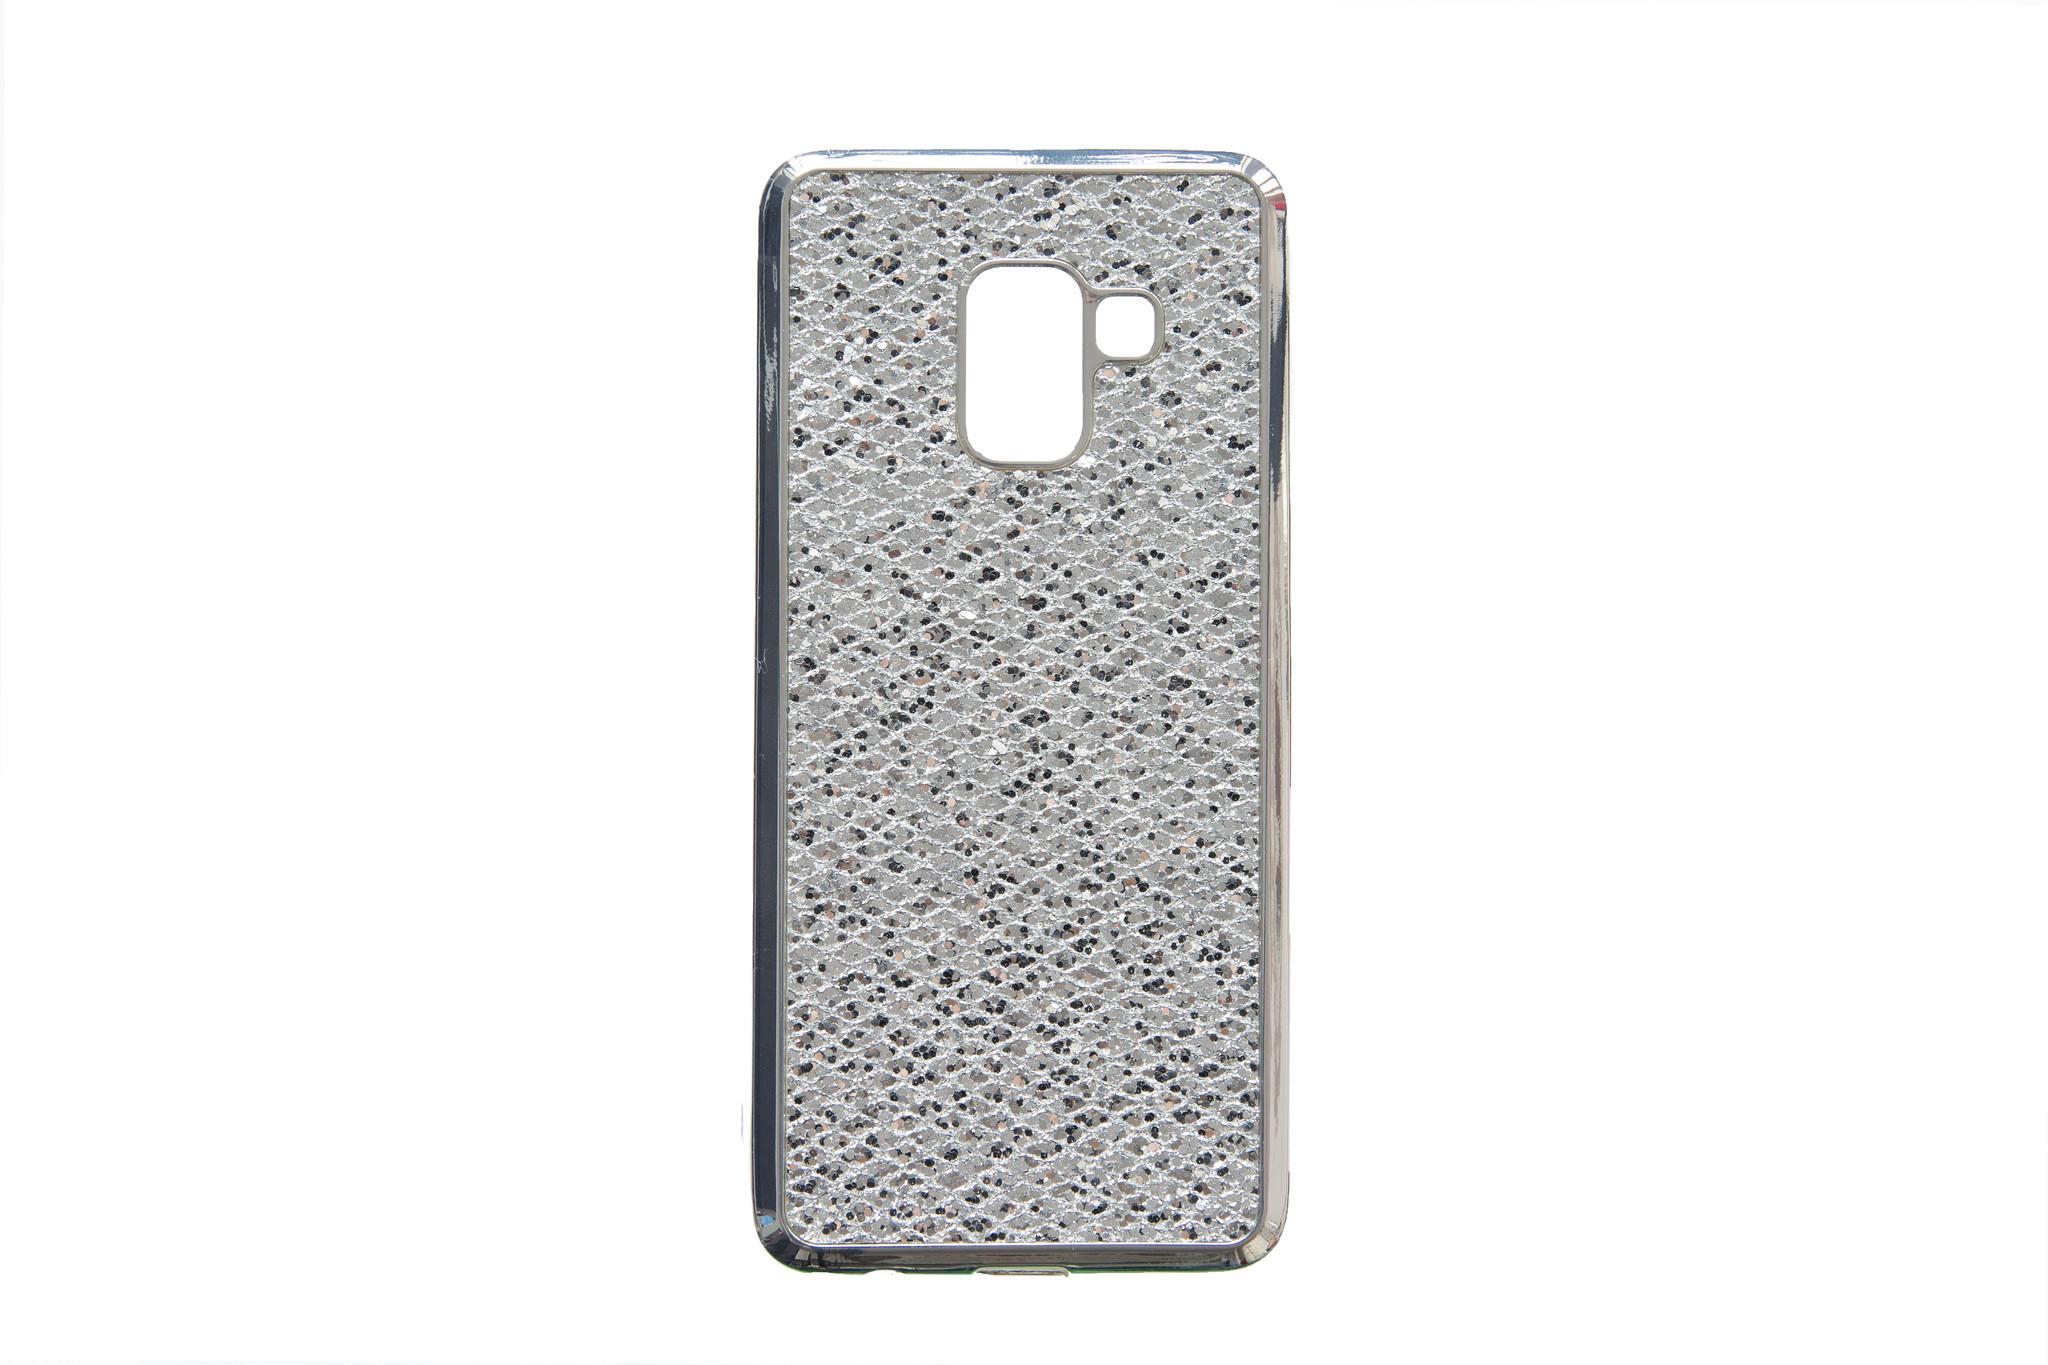 Smartphonehoesje Samsung A8 | Bling met glitters | Zilver